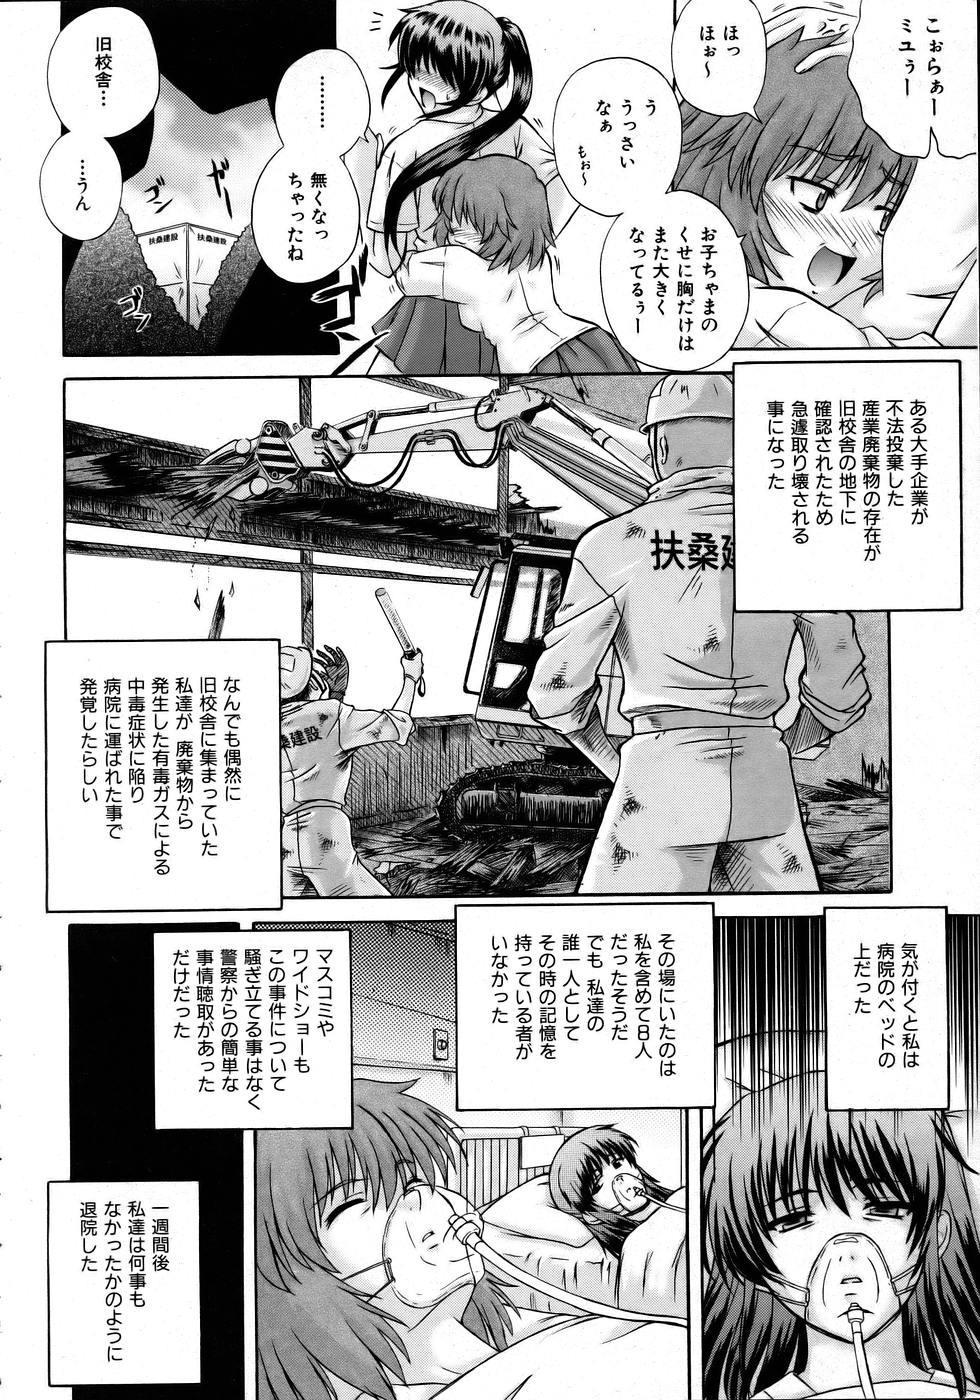 COMIC AUN 2005-12 Vol. 115 135